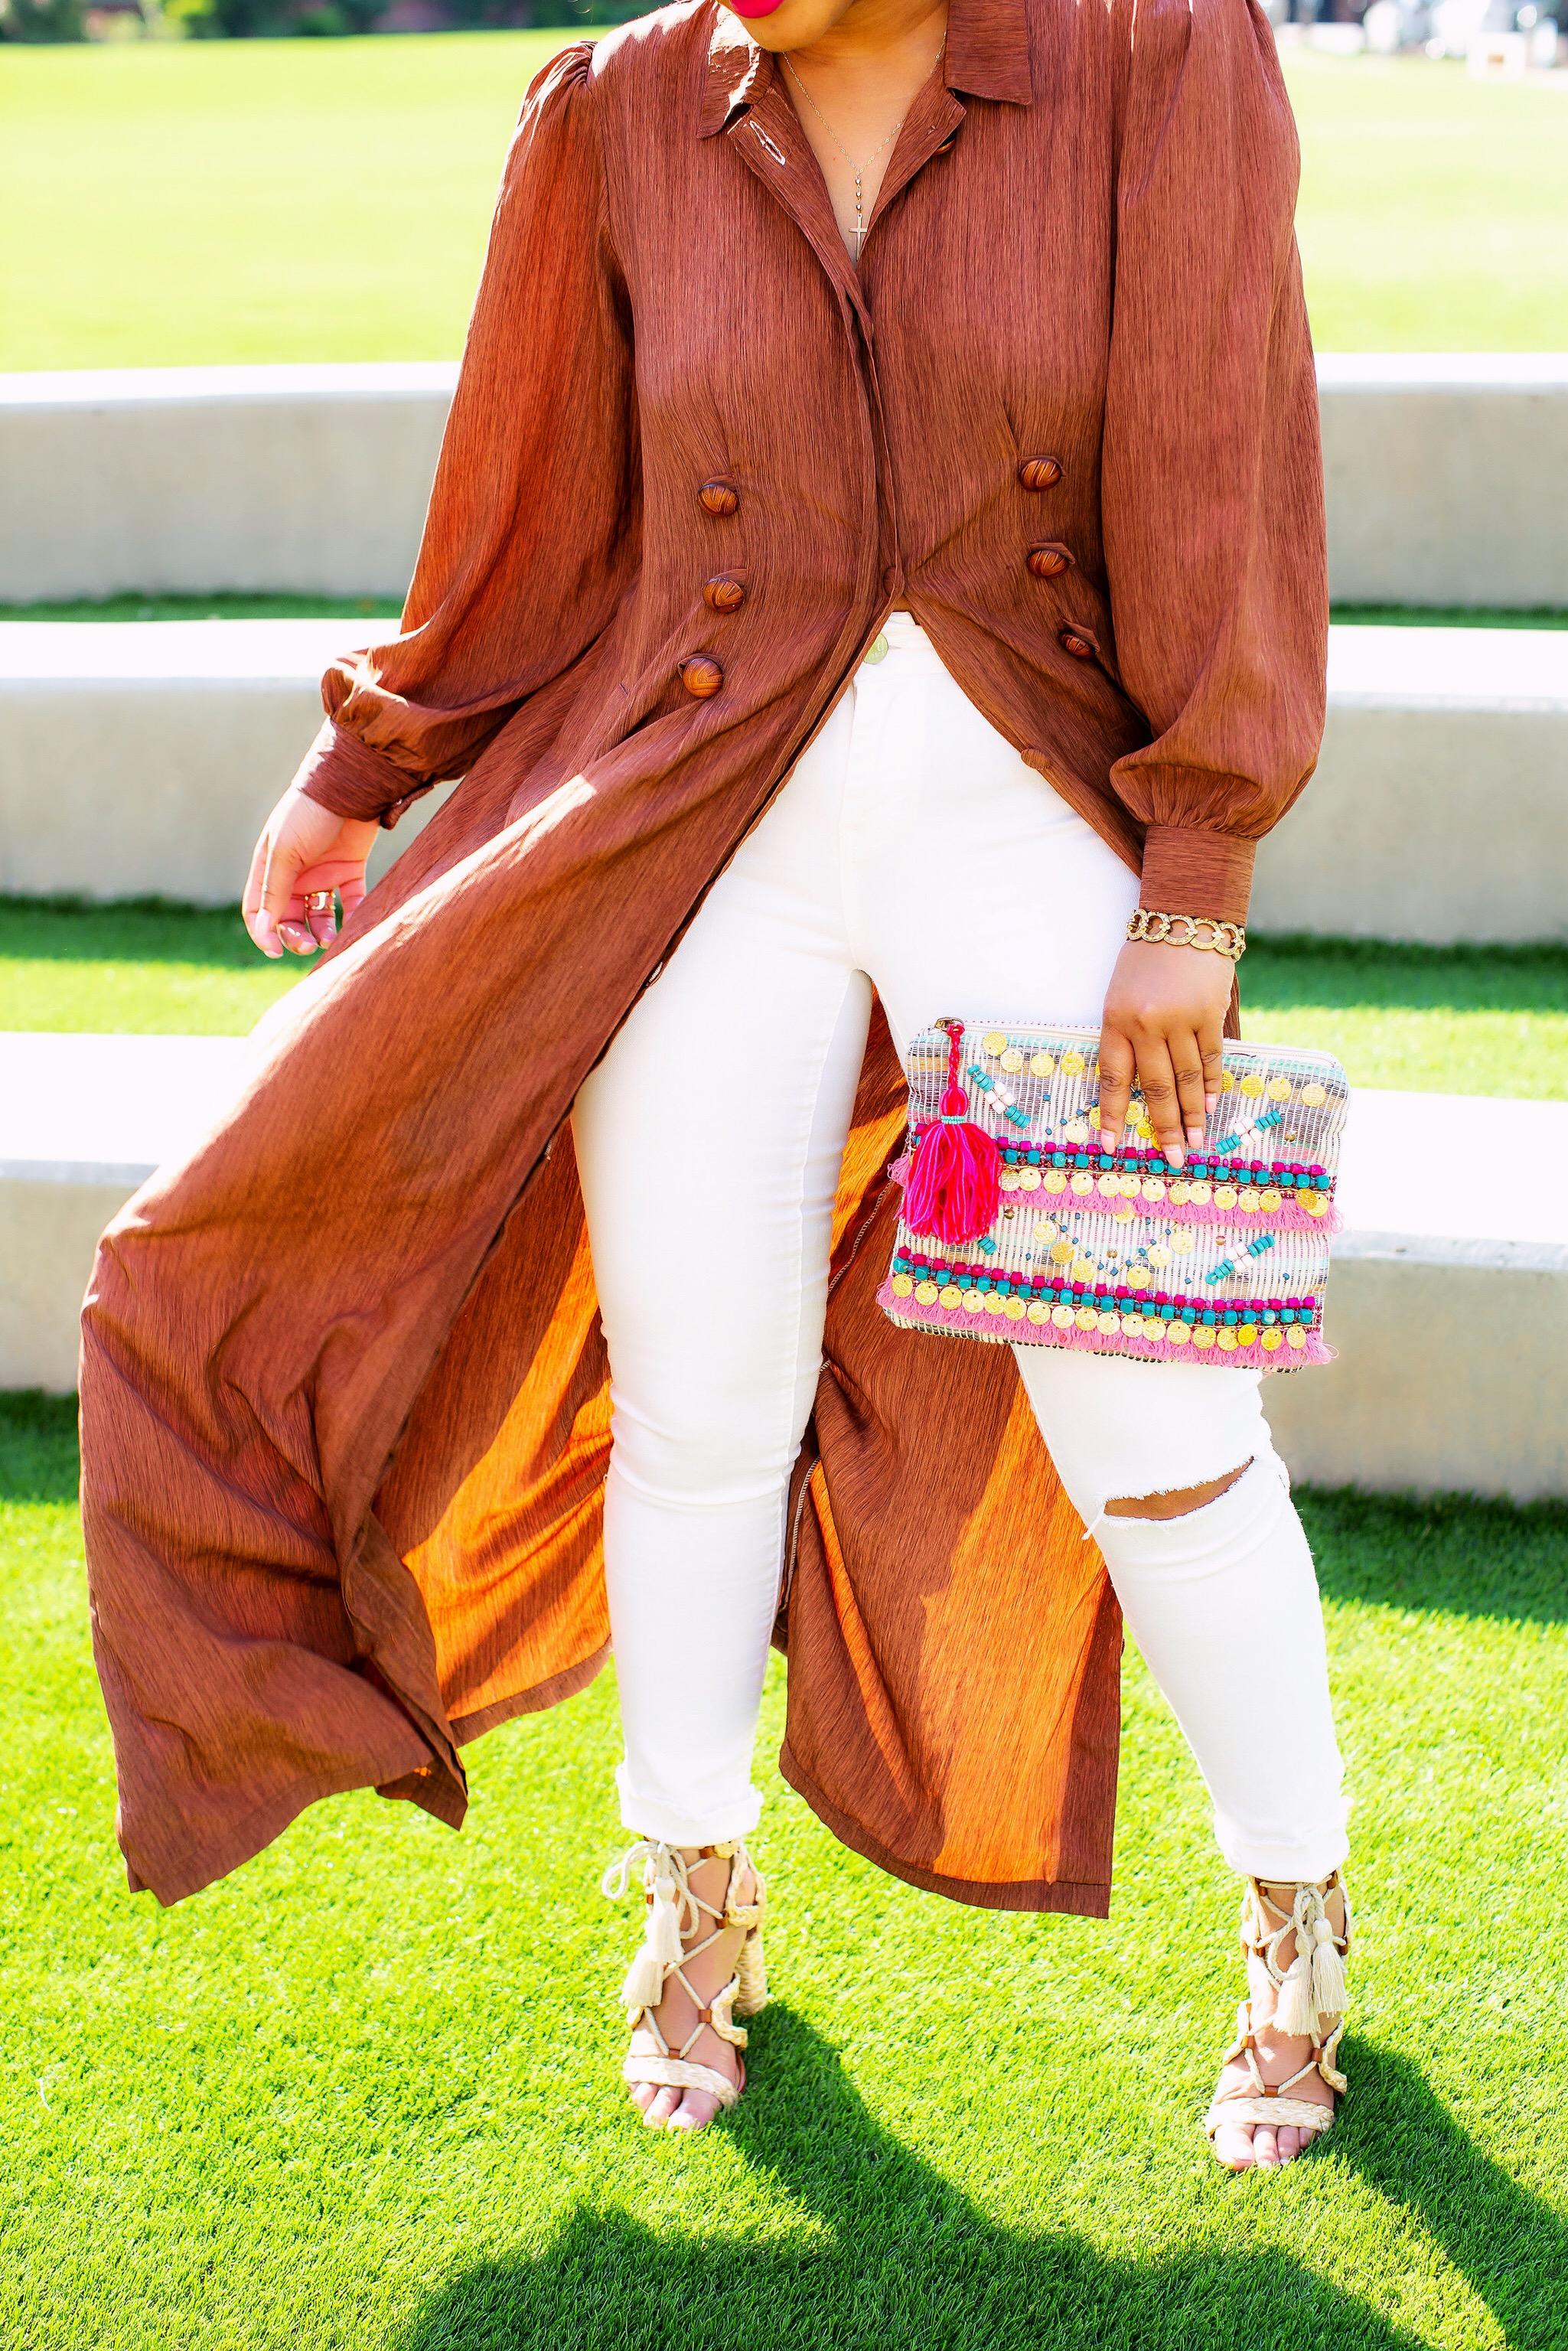 White Jeans - J Brand (TJ Maxx) -  similar white denim